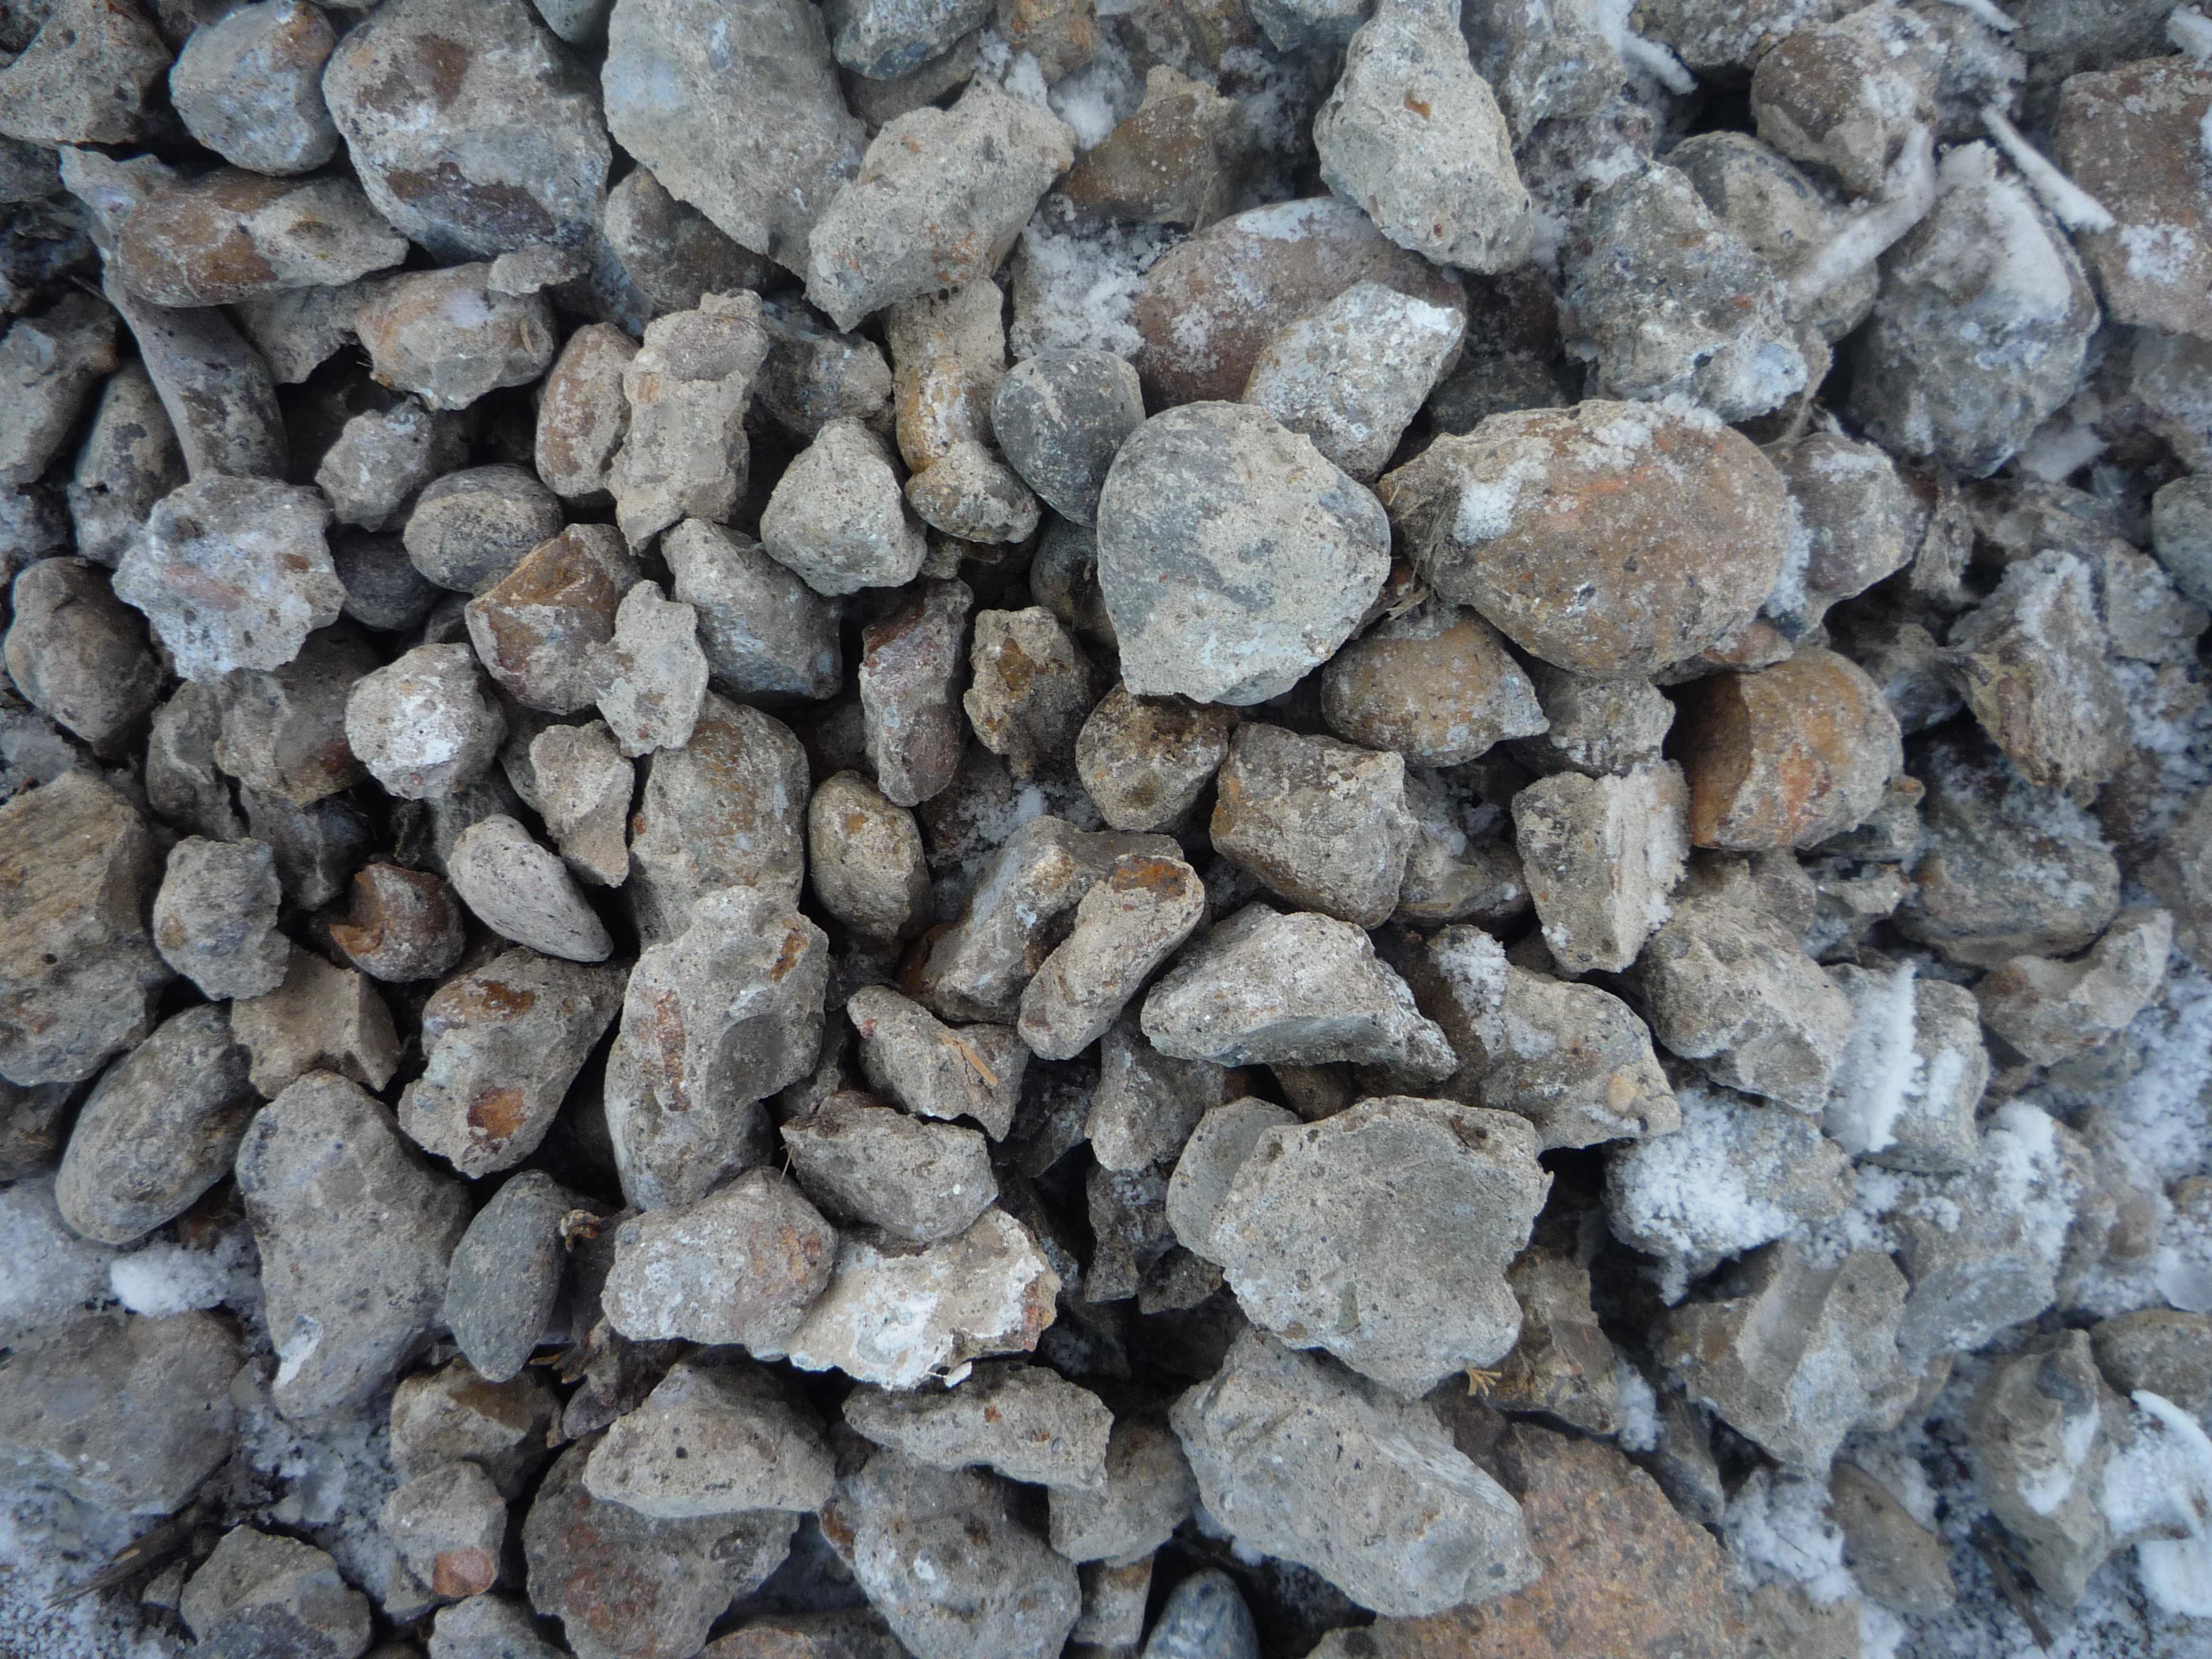 Concrete rubble secondary